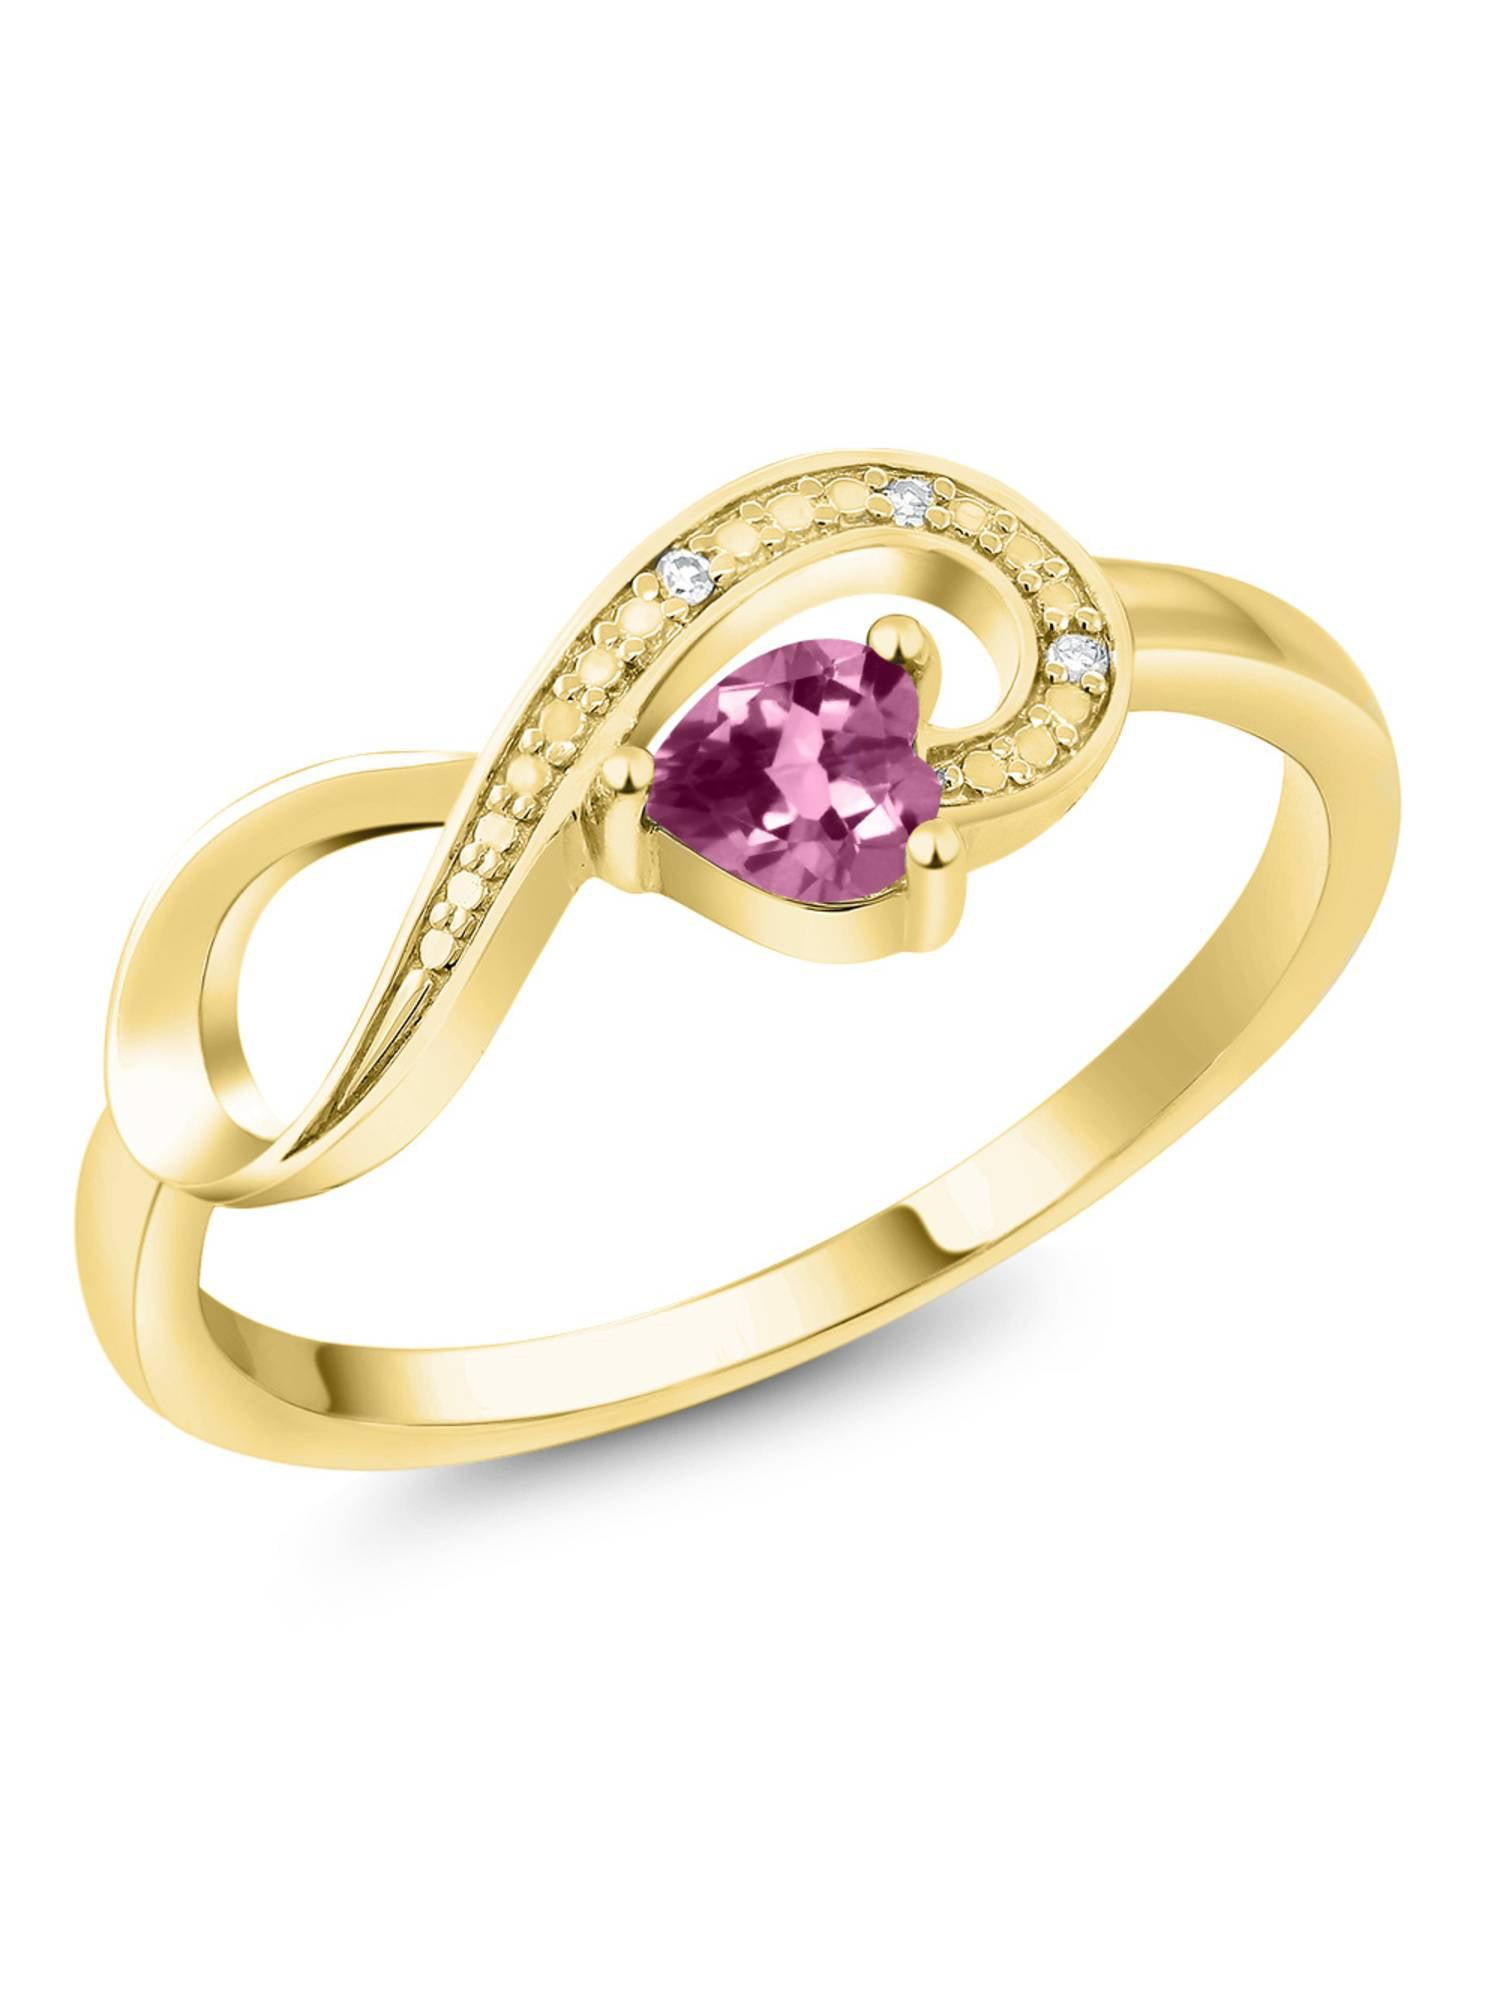 10K Yellow Gold 0.21 Ct Heart Shape Pink Tourmaline Diamond Infinity Ring by